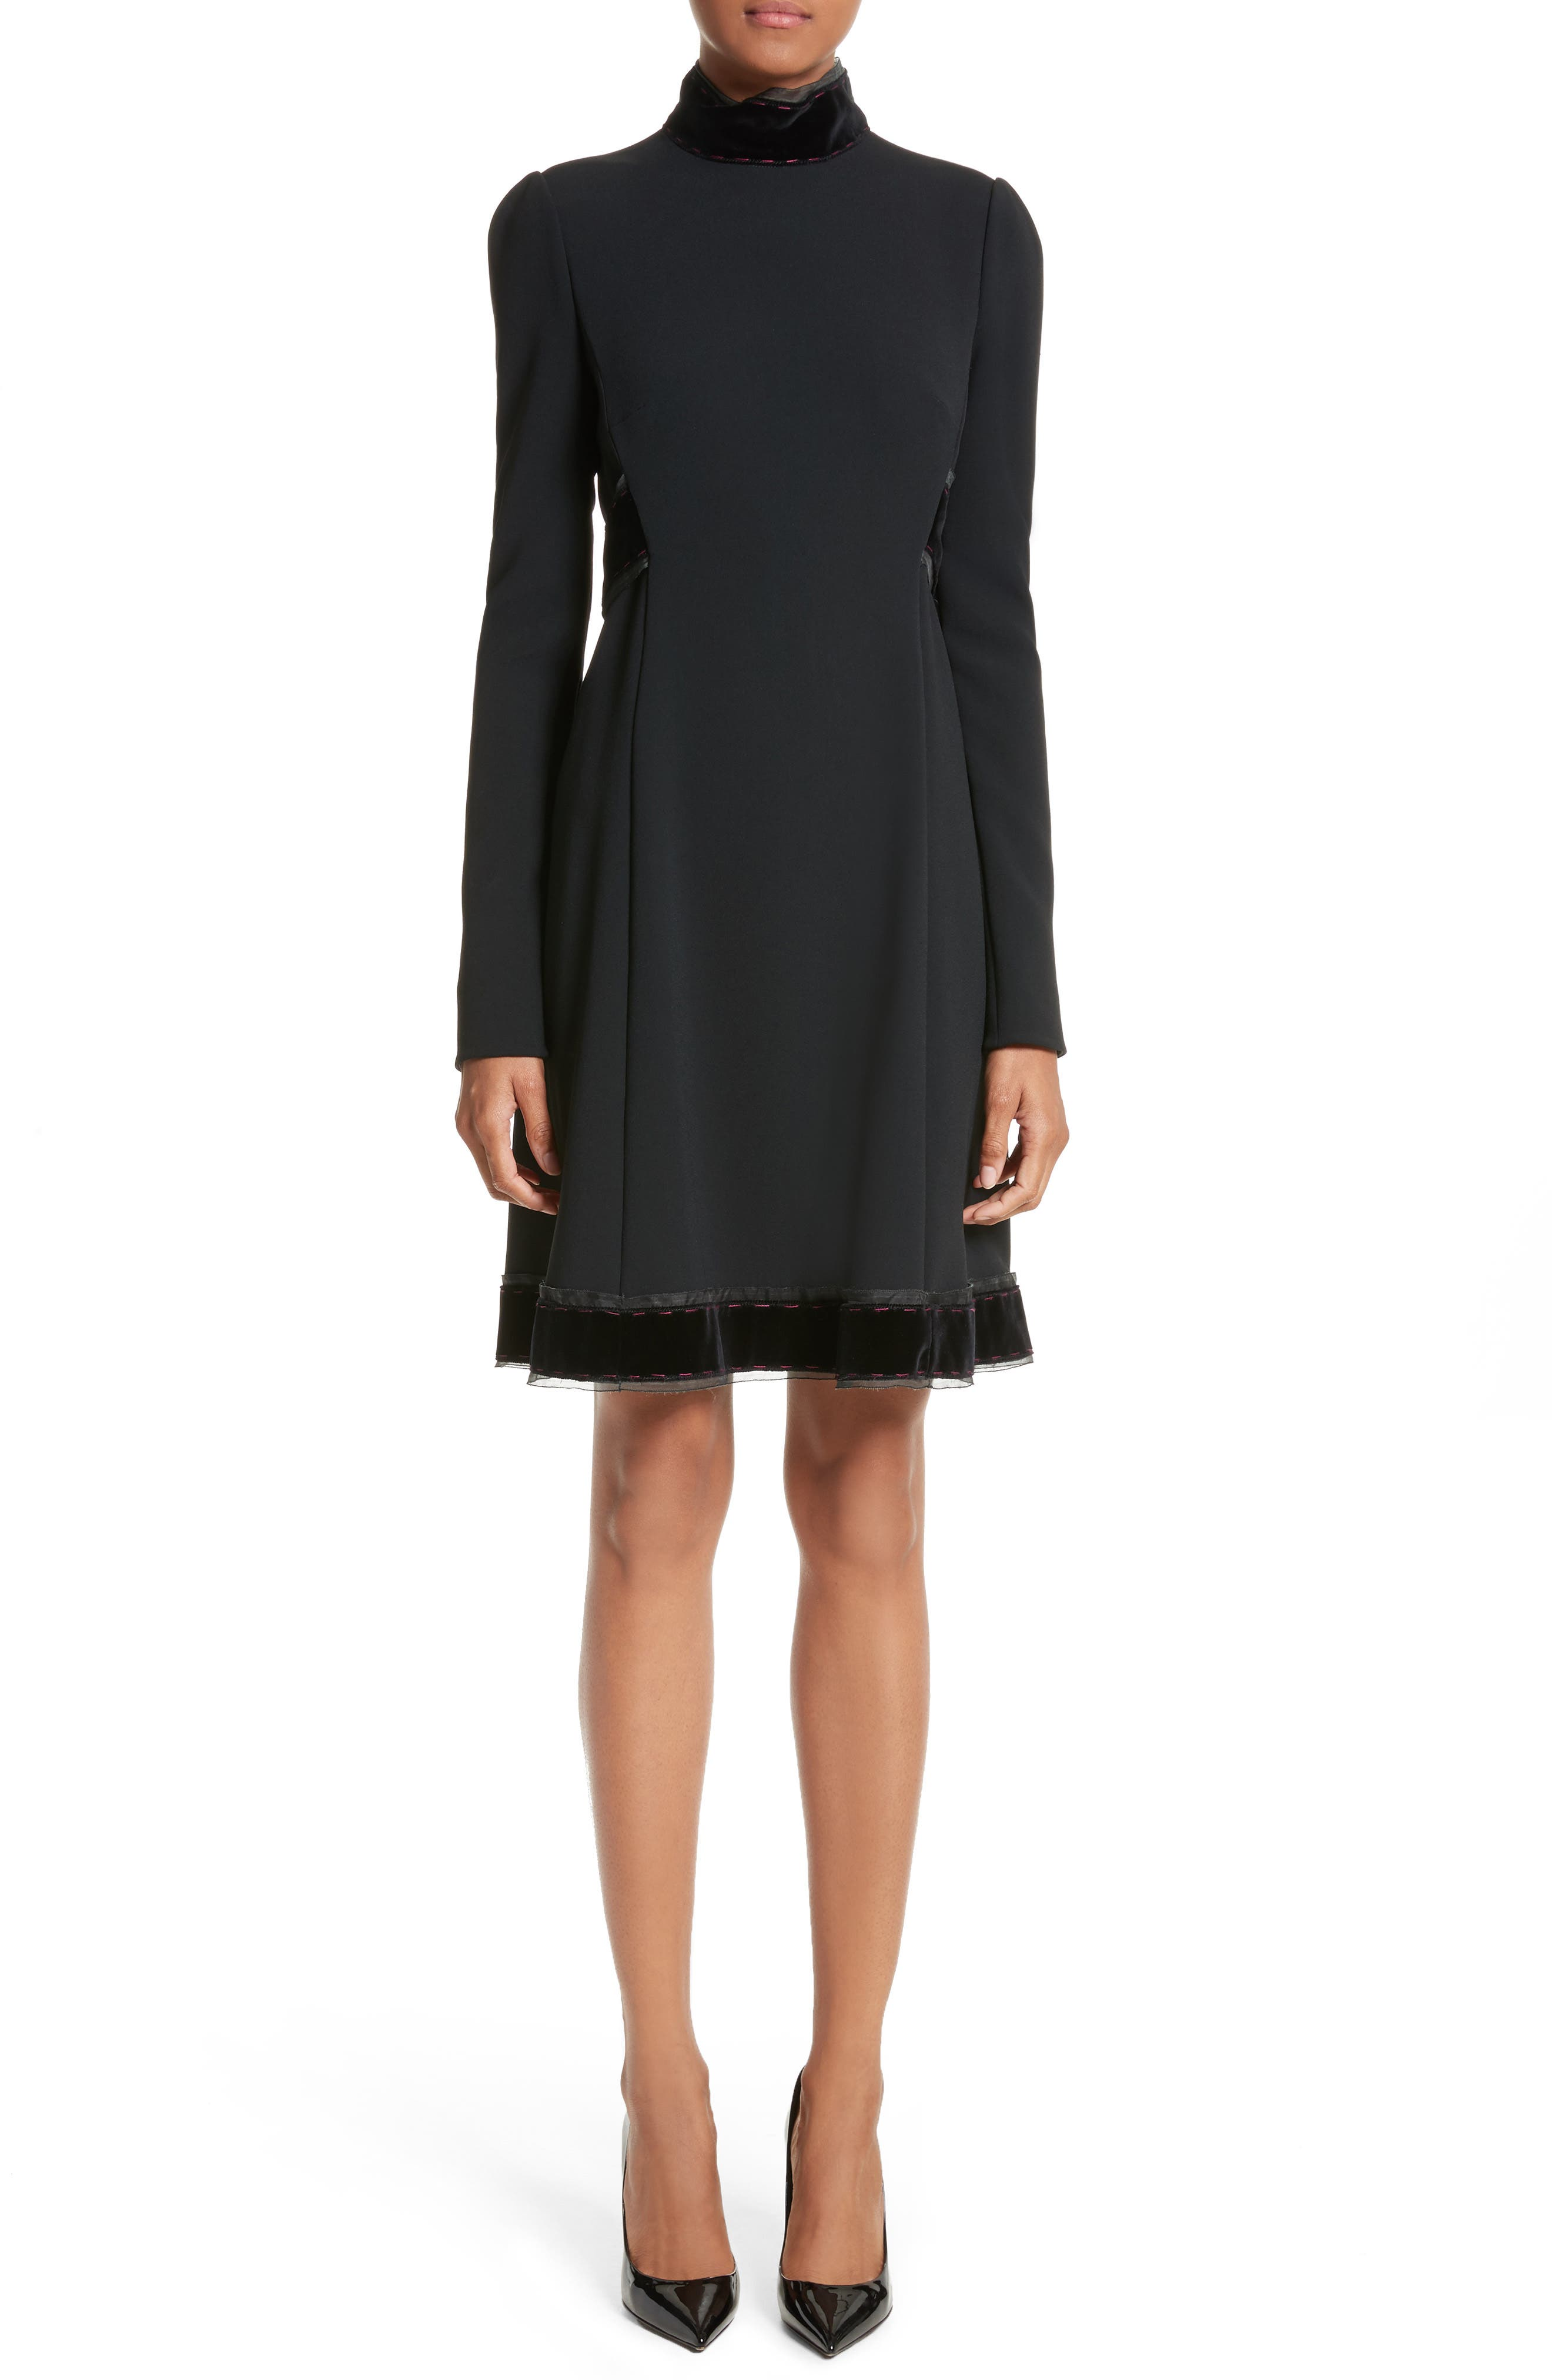 Dolce&Gabbana Velvet Trim Cady Turtleneck Dress